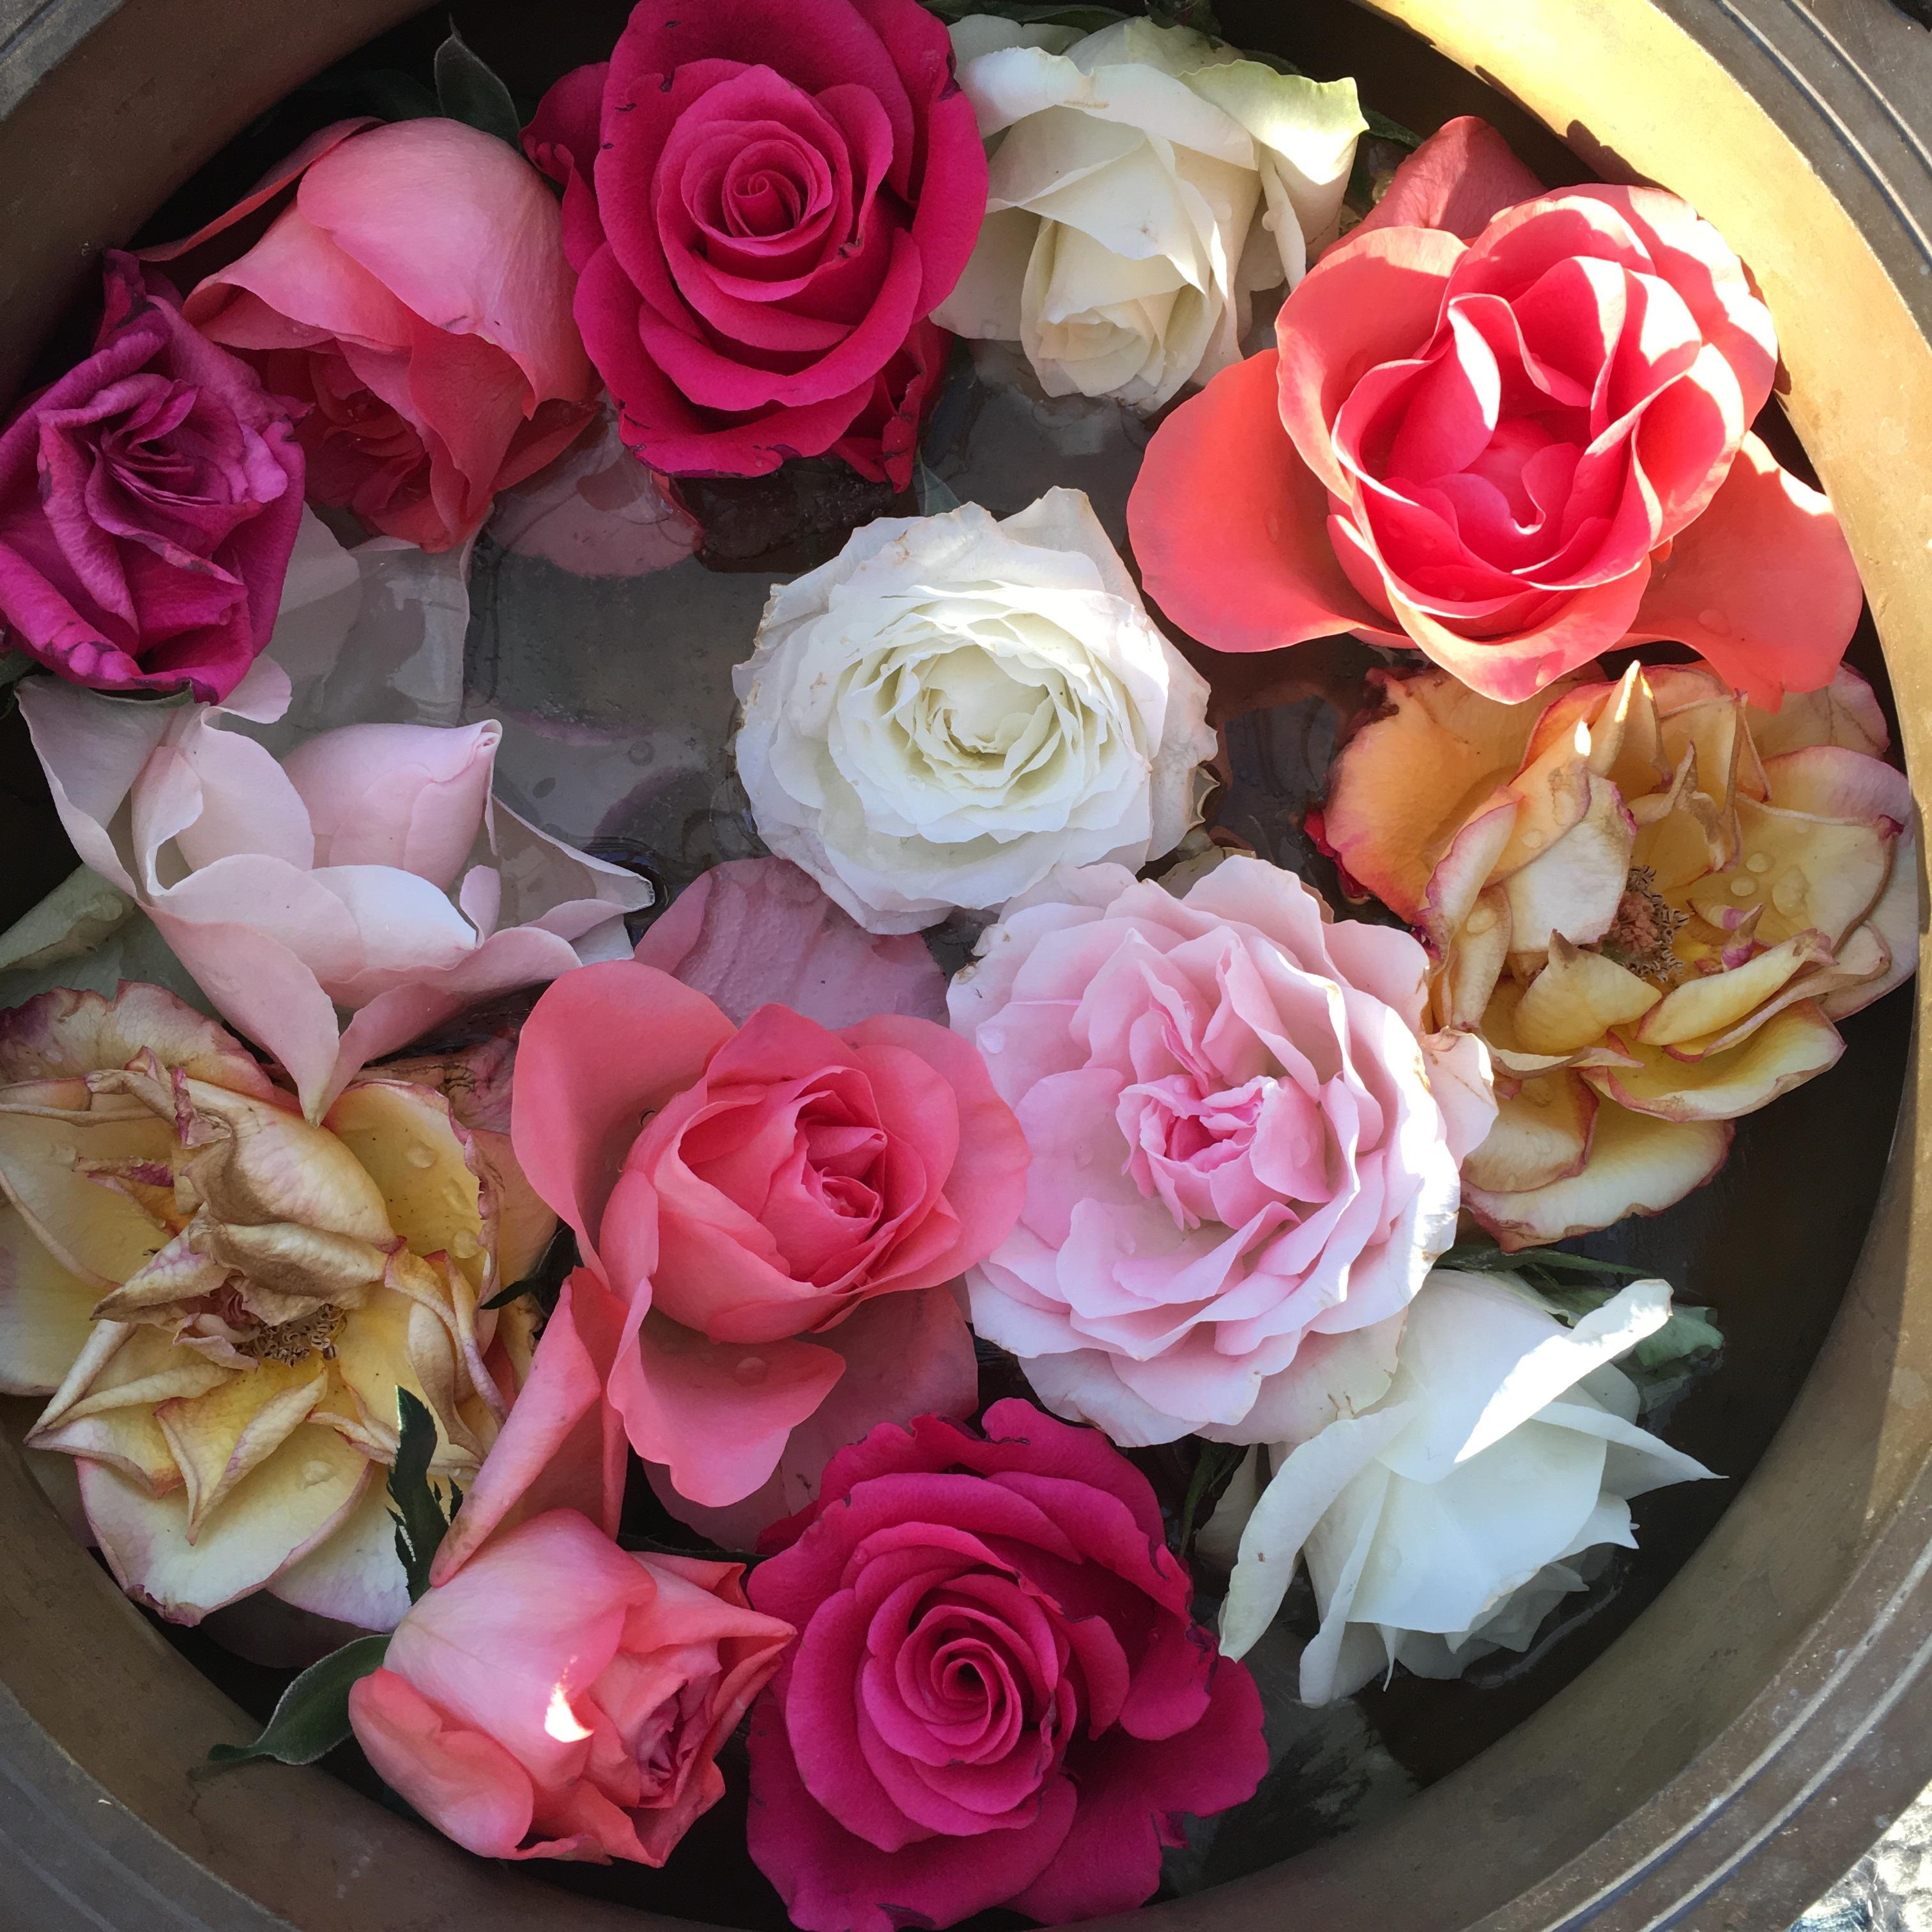 Rosor i skål